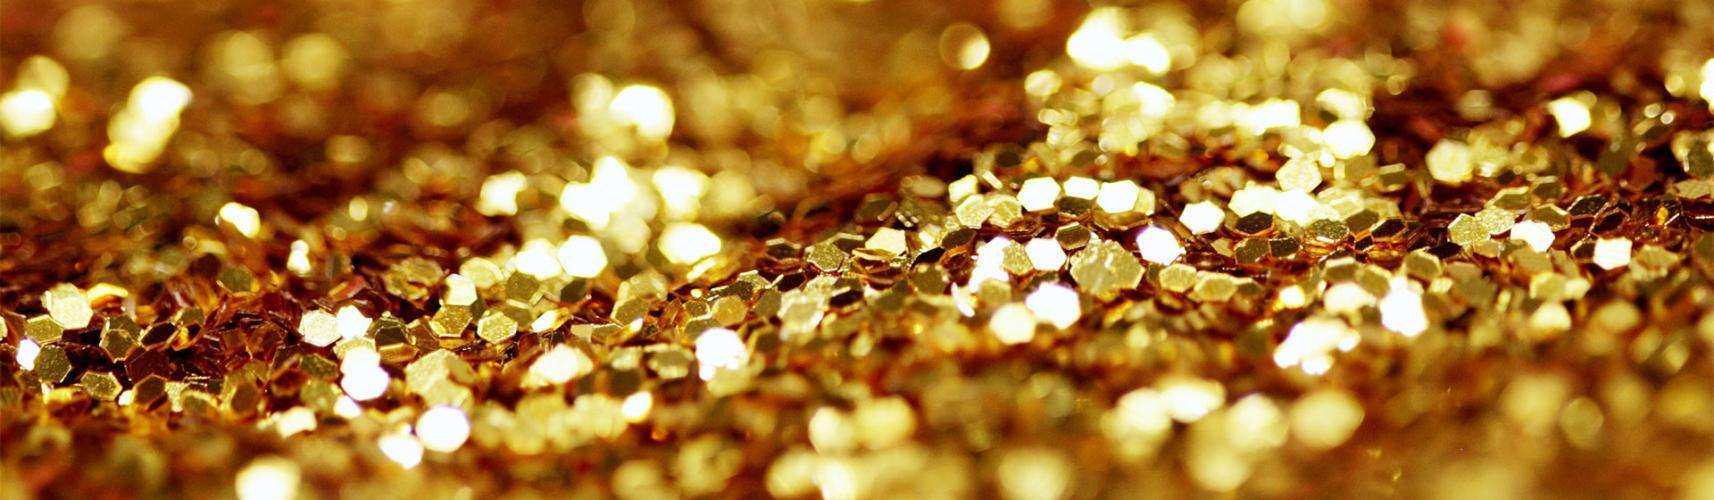 Оценка золота